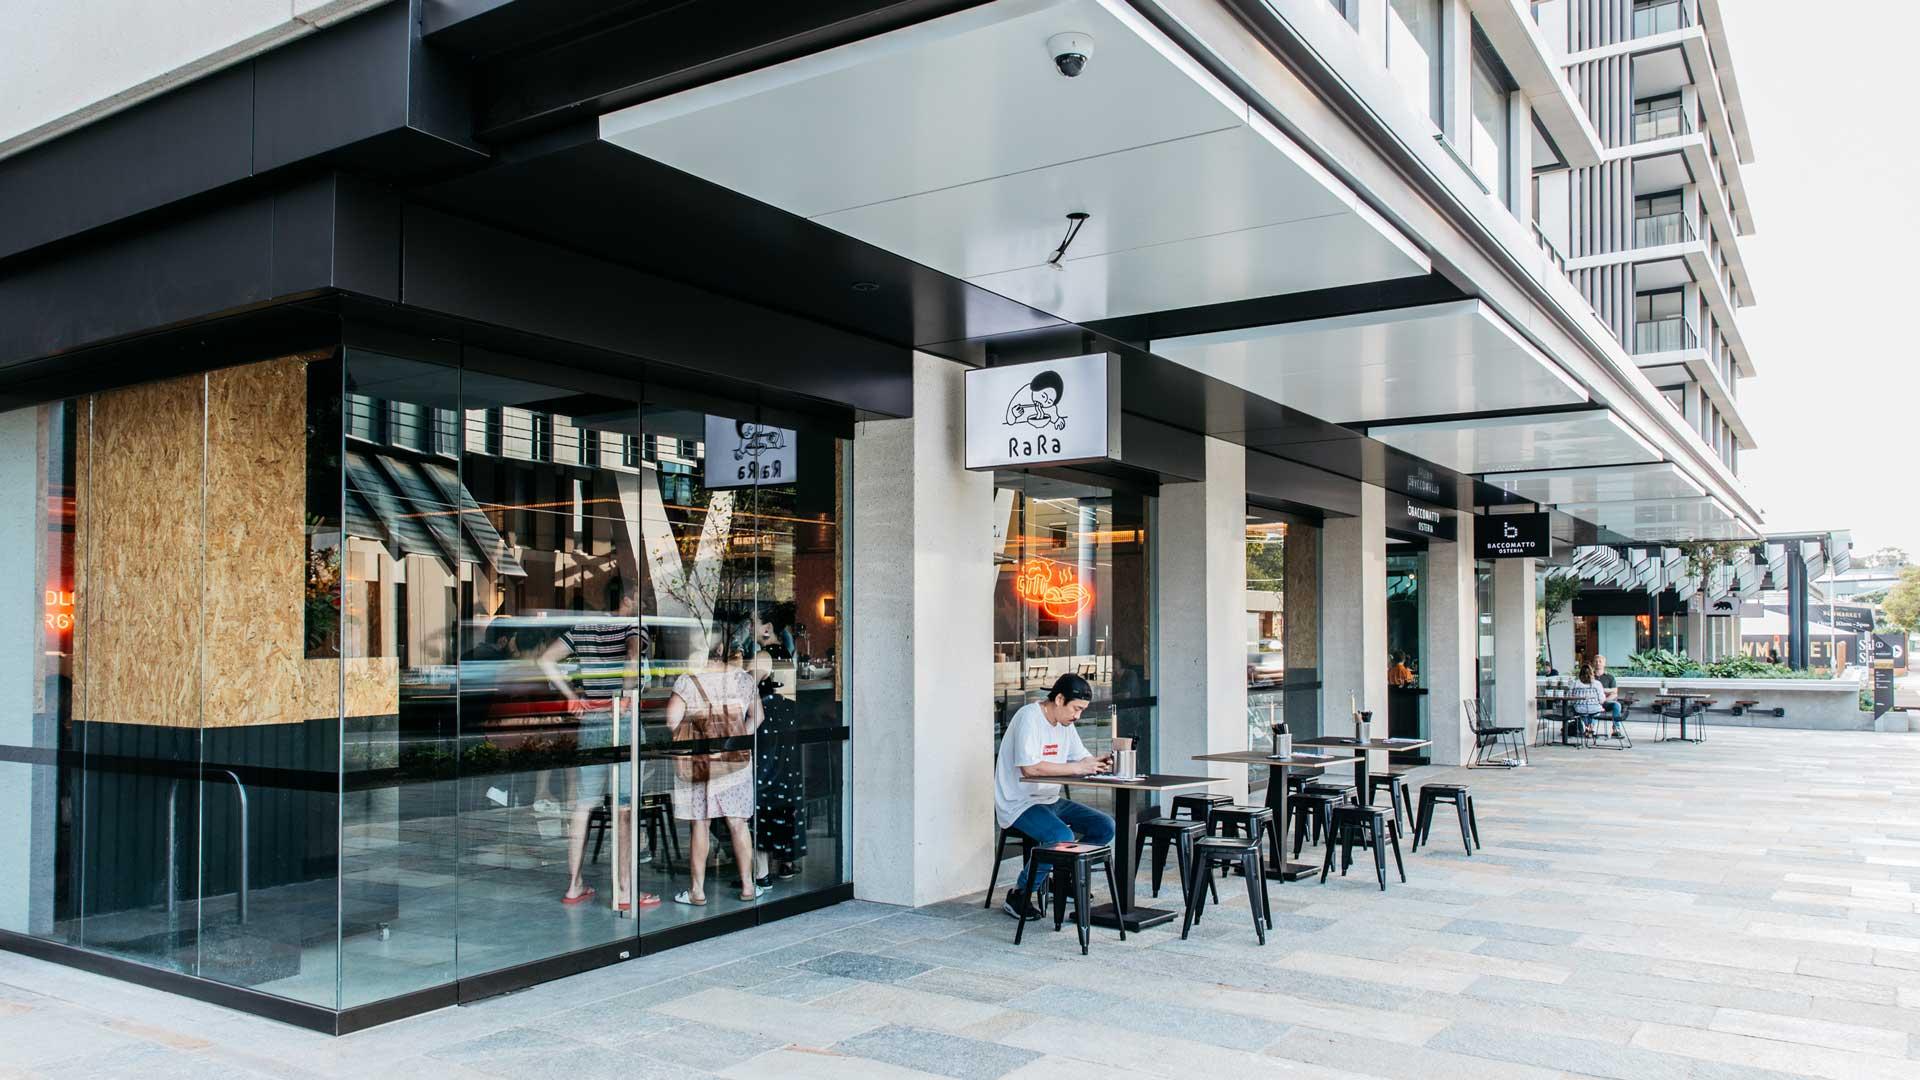 Redfern's Super-Popular Ramen Bar RaRa Has Opened a Second Outpost in Randwick